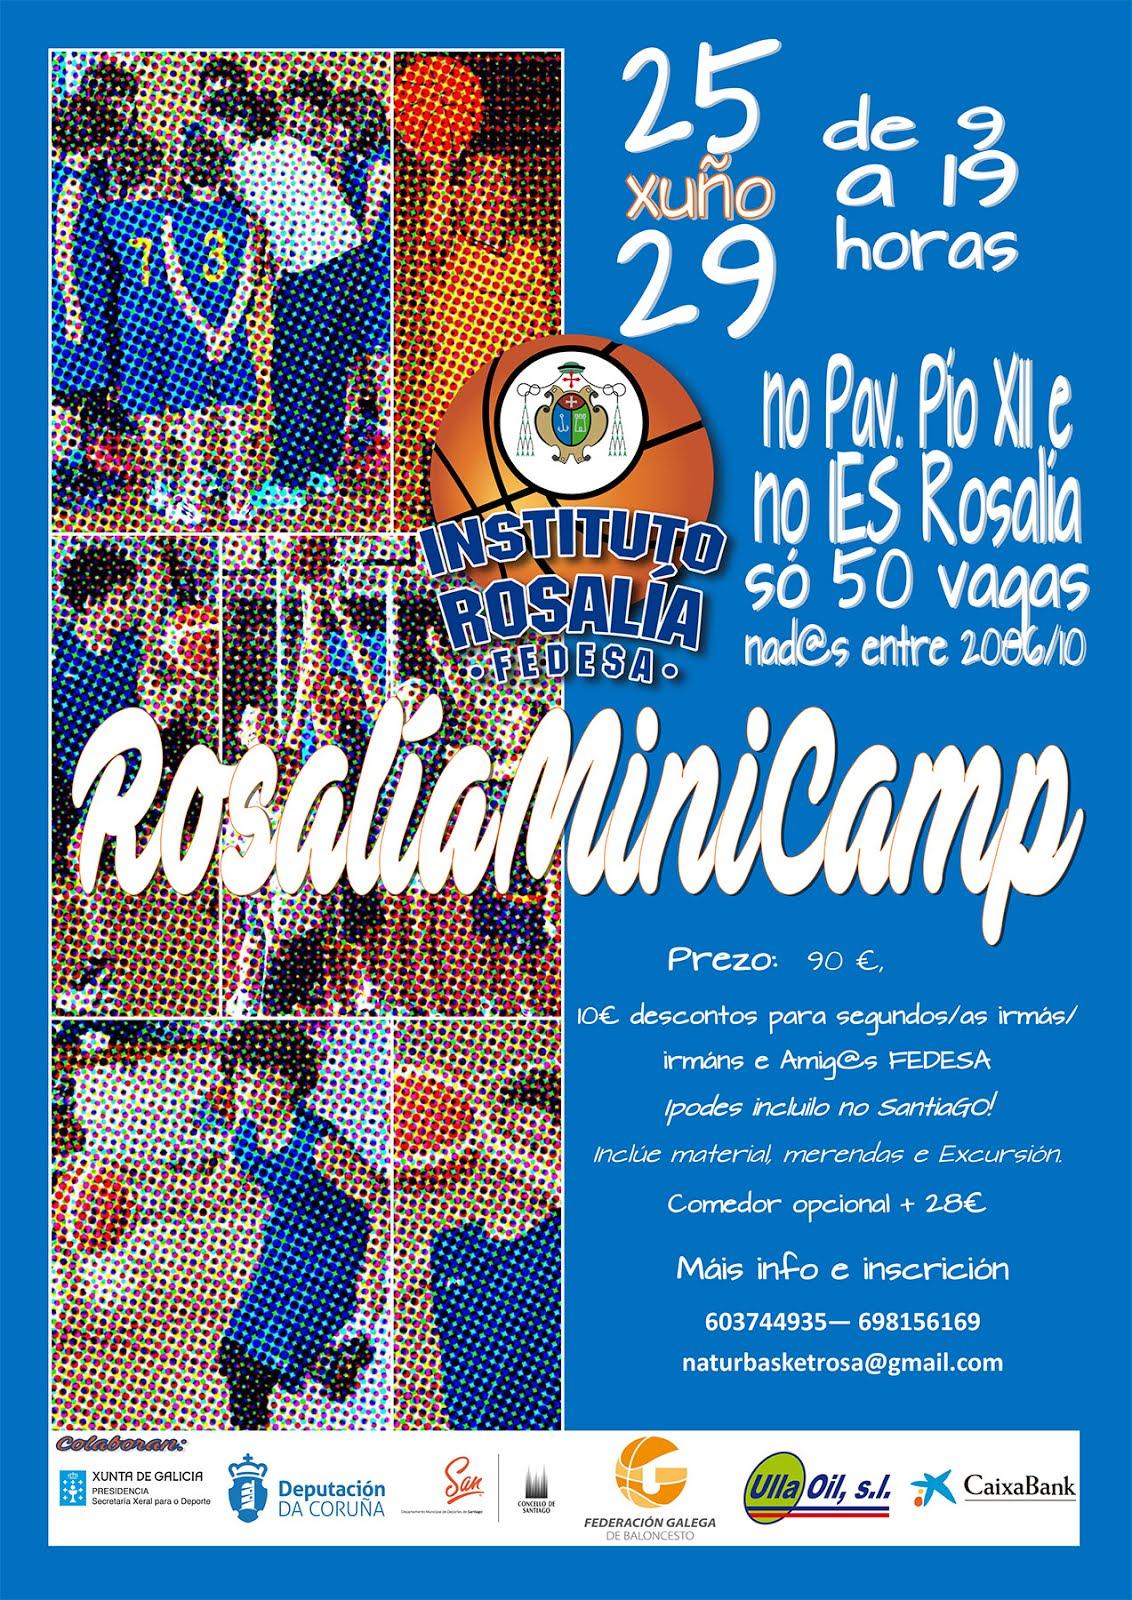 MiniCamp18 (25 a 29 de junio)